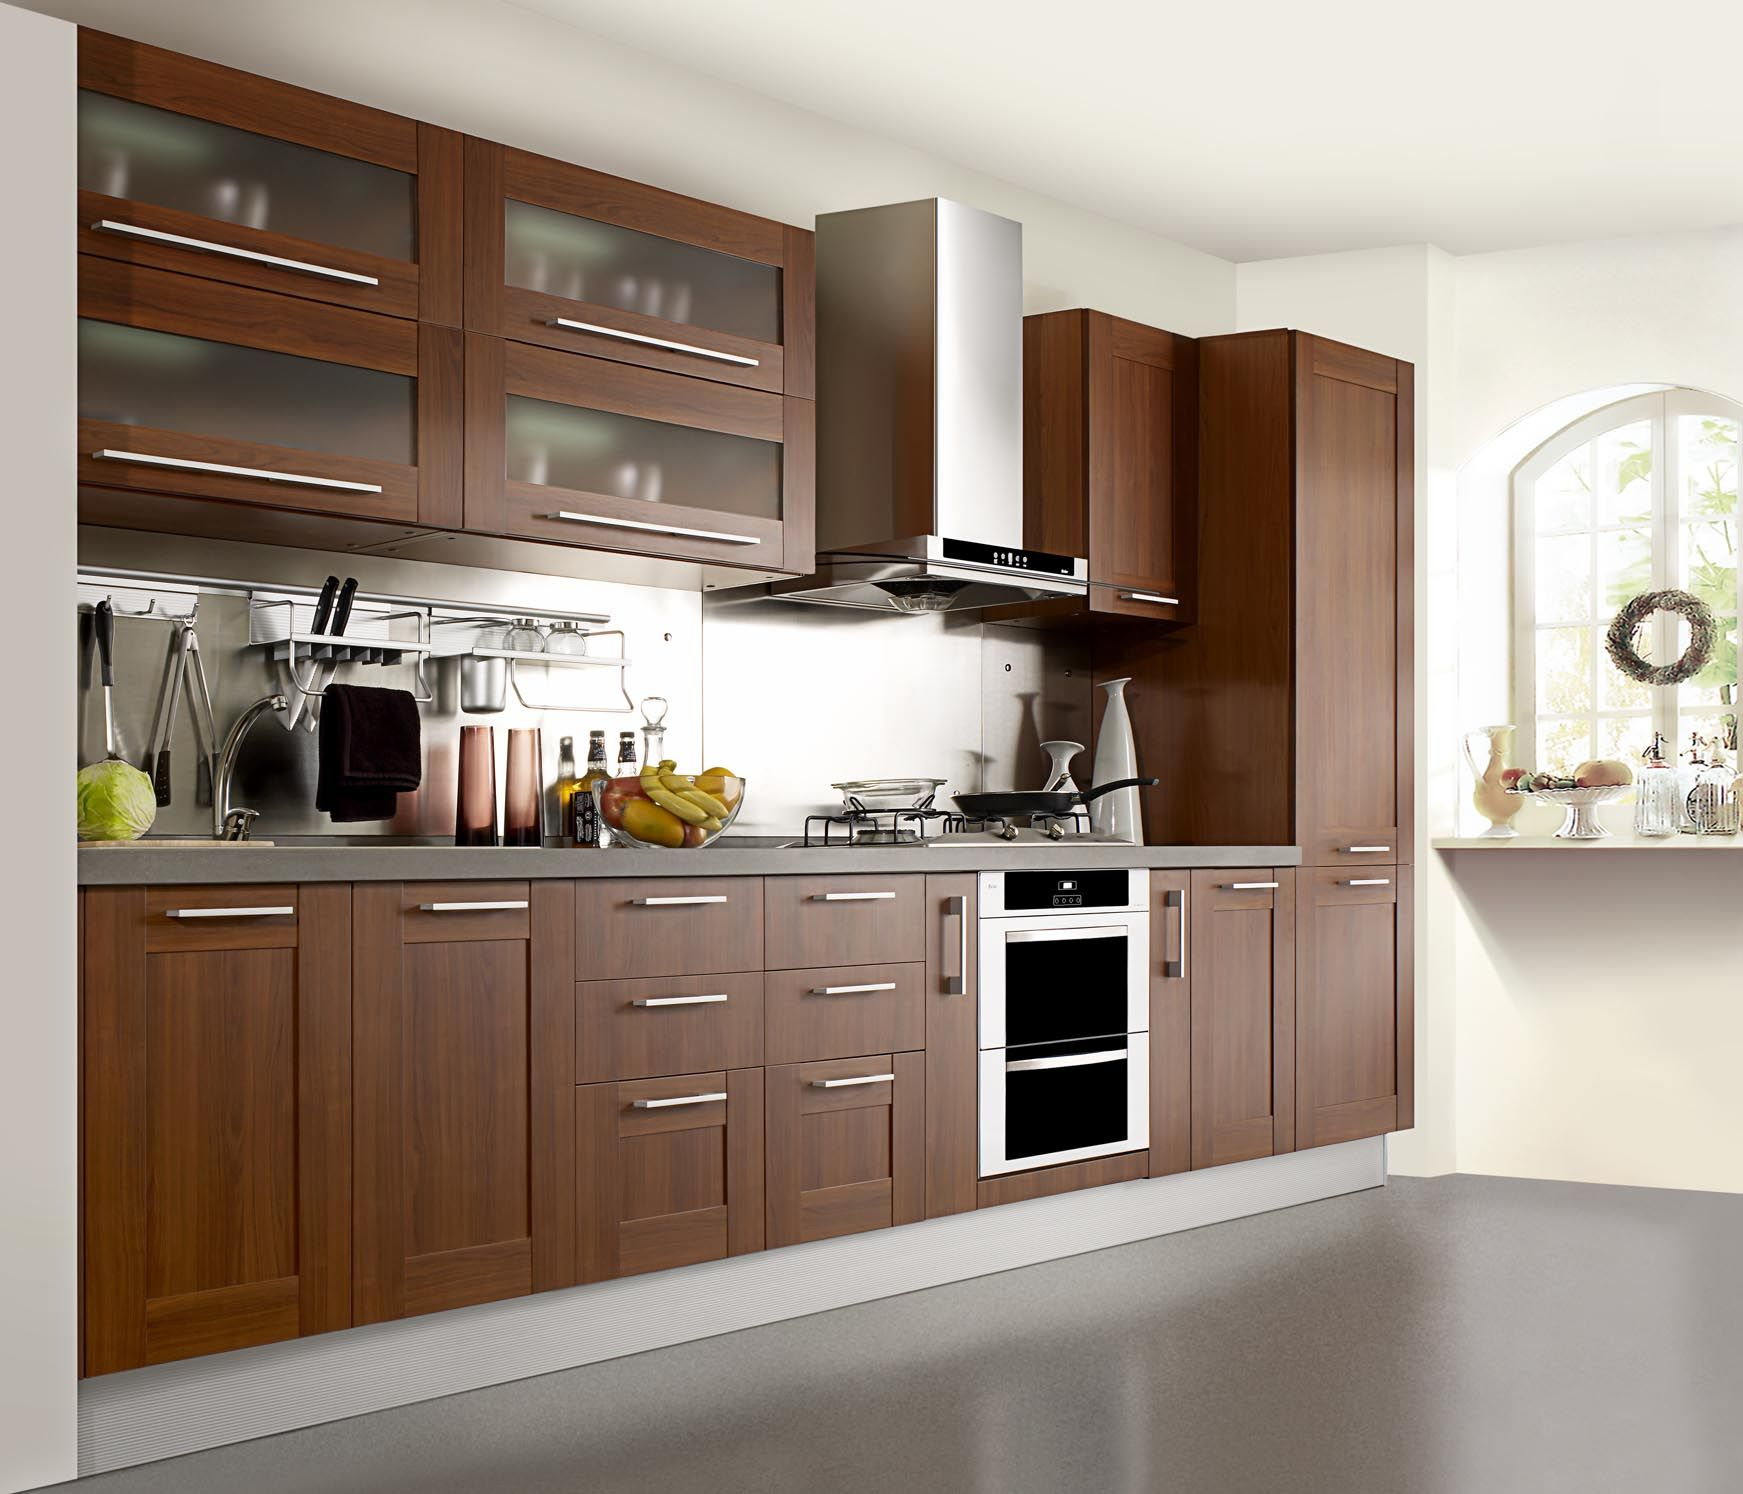 Interior Veneer Kitchen Cabinets este modelo de muebles home sweet hsh pinterest wood showcase of impressive wooden kitchen interior design